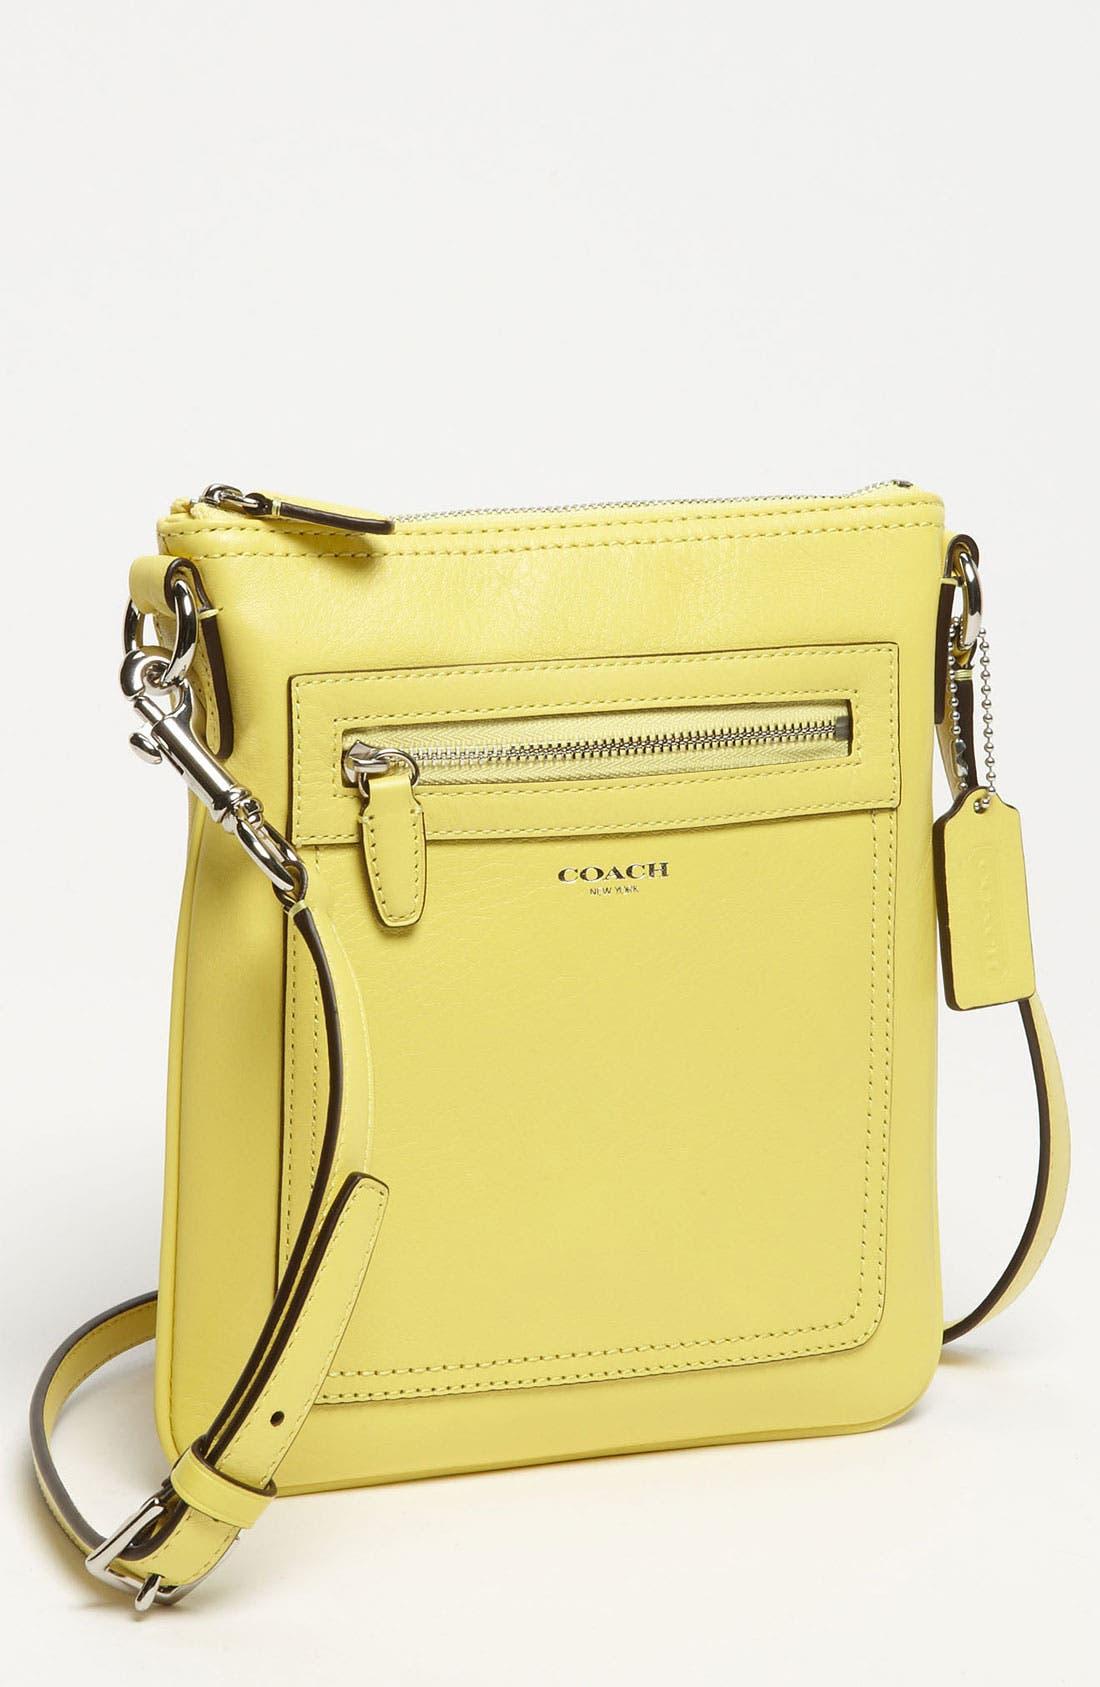 Main Image - COACH 'Legacy' Leather Crossbody Bag